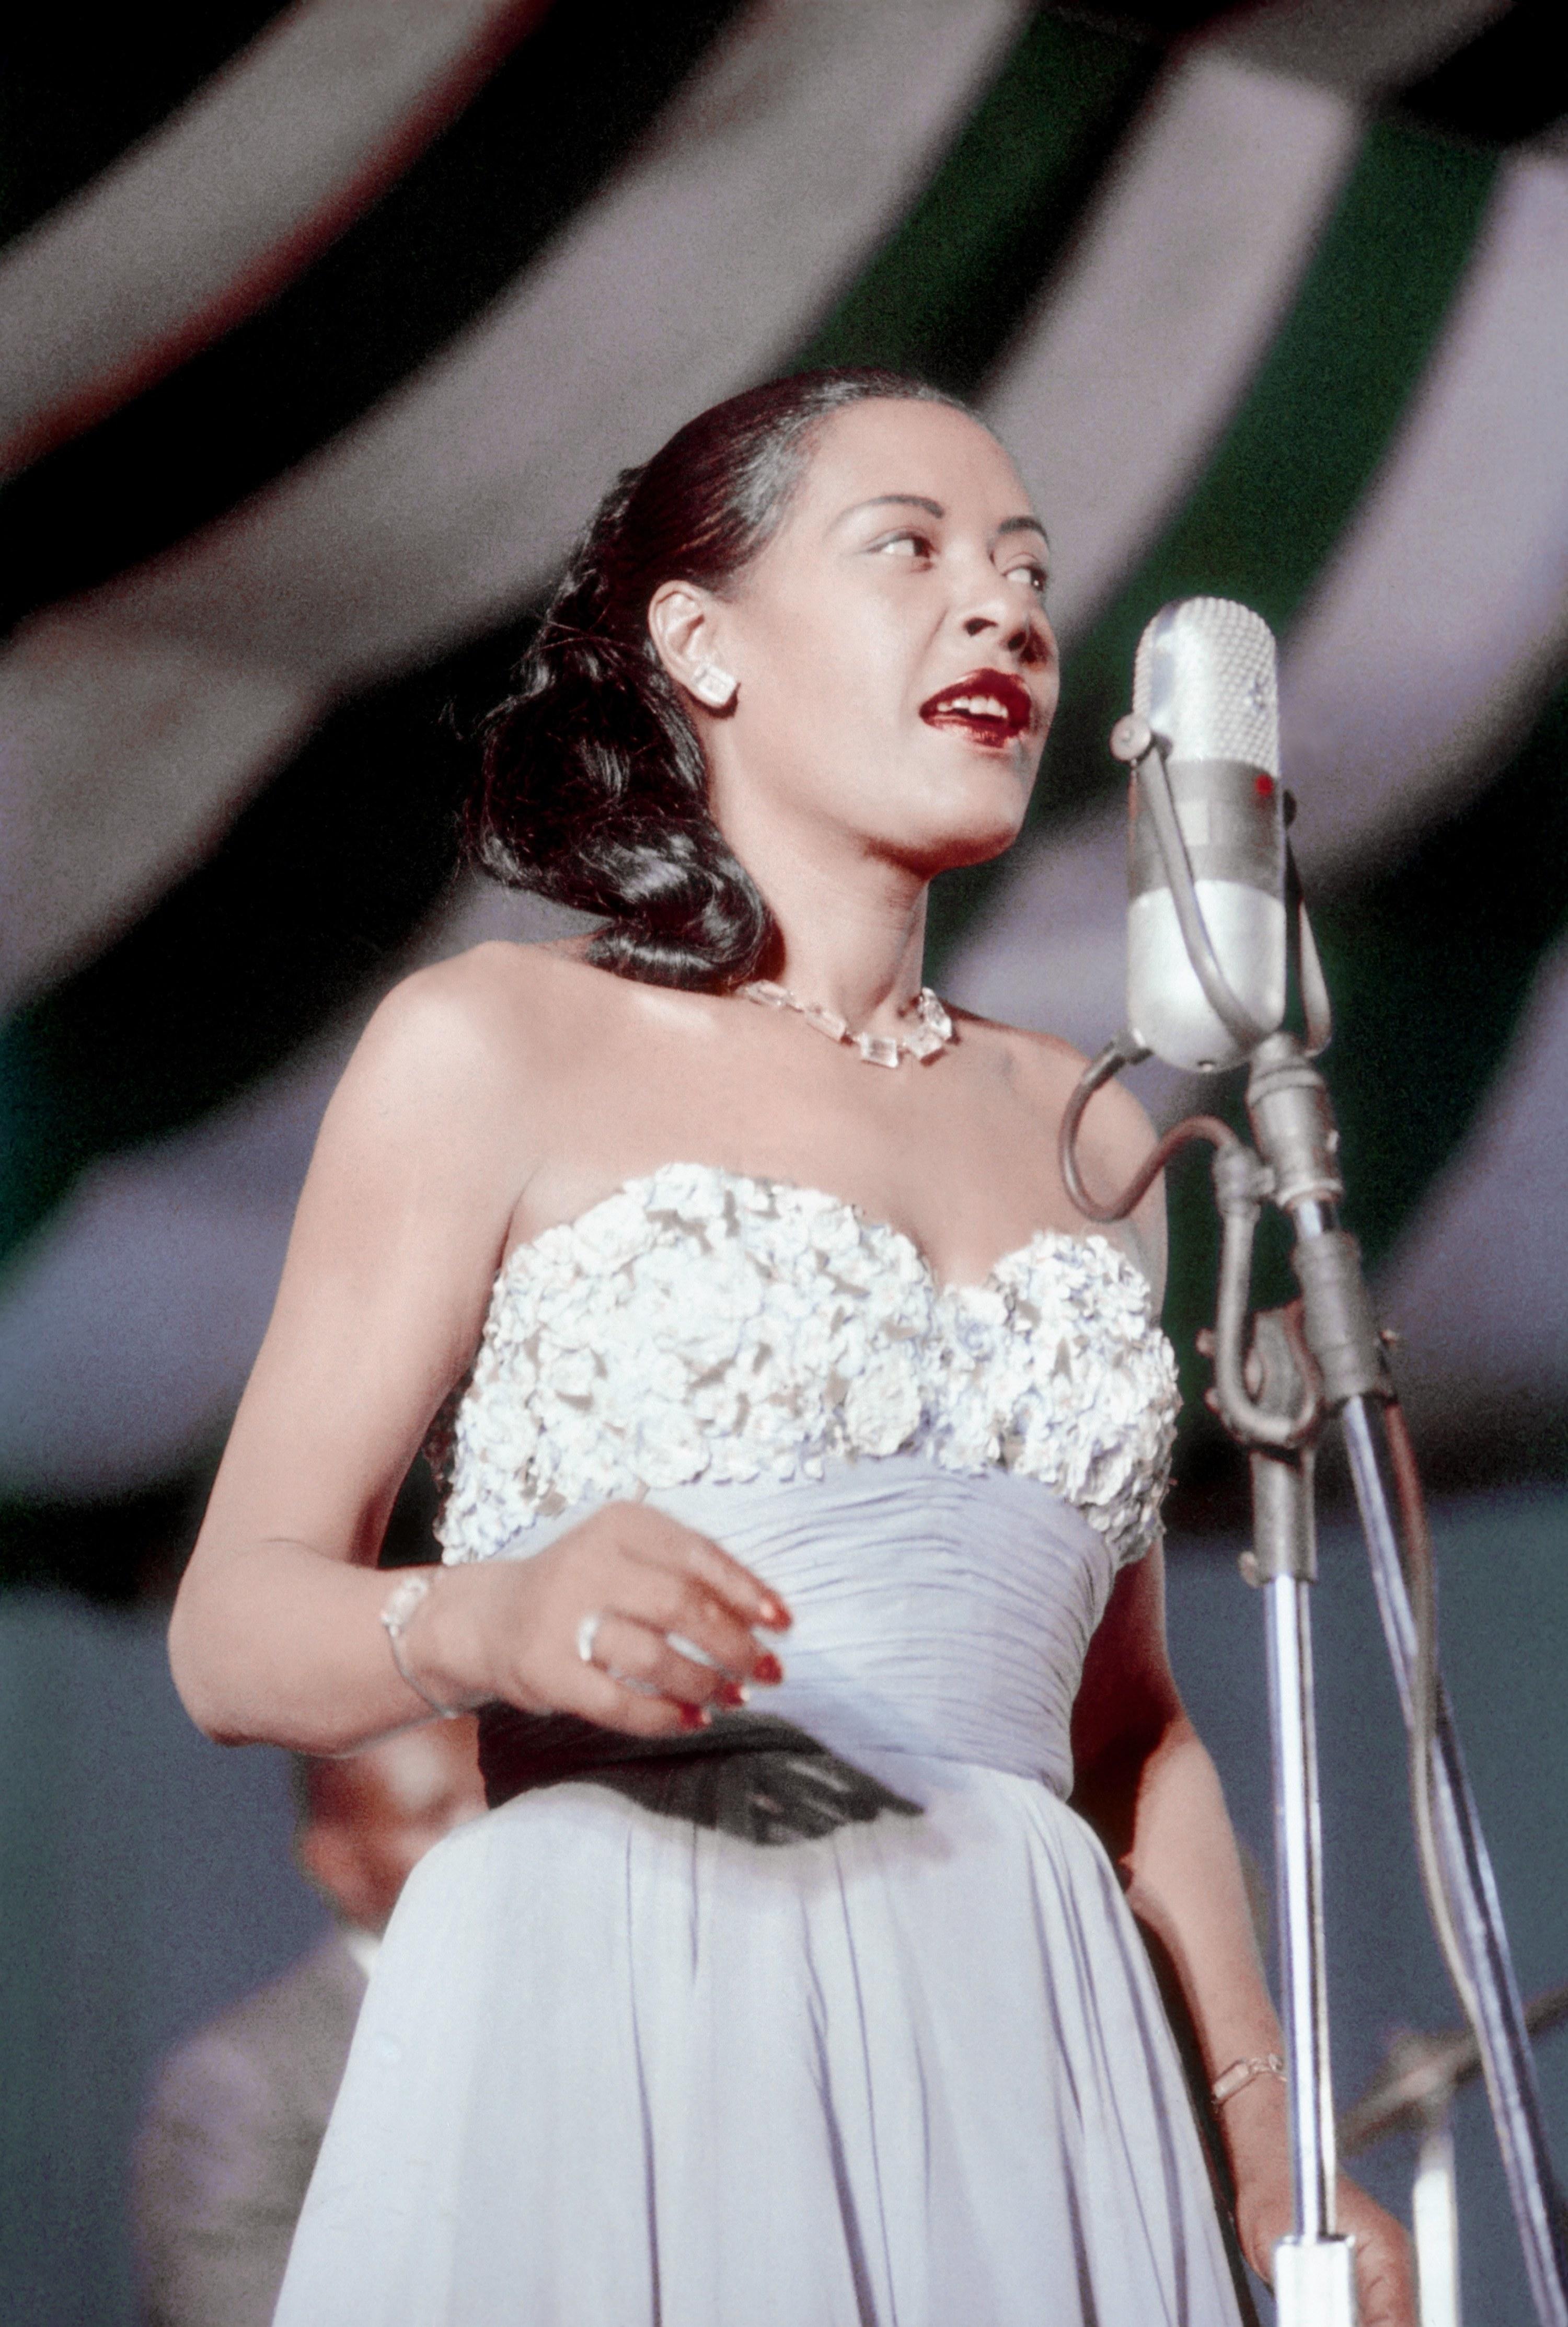 Billie Holiday performing at Newport Jazz Festival